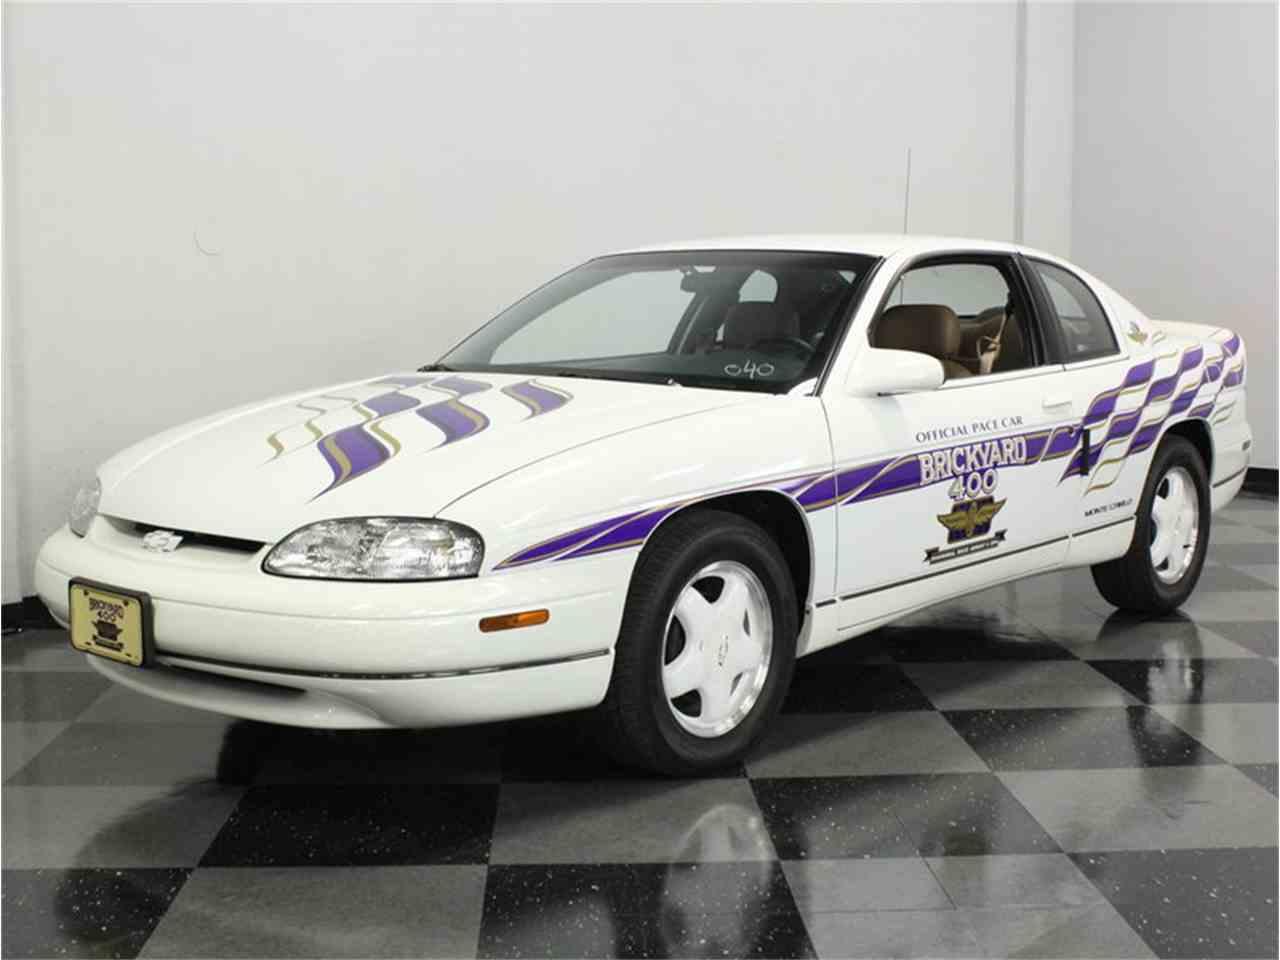 1995 chevrolet monte carlo pace car for sale cc 1034321. Black Bedroom Furniture Sets. Home Design Ideas